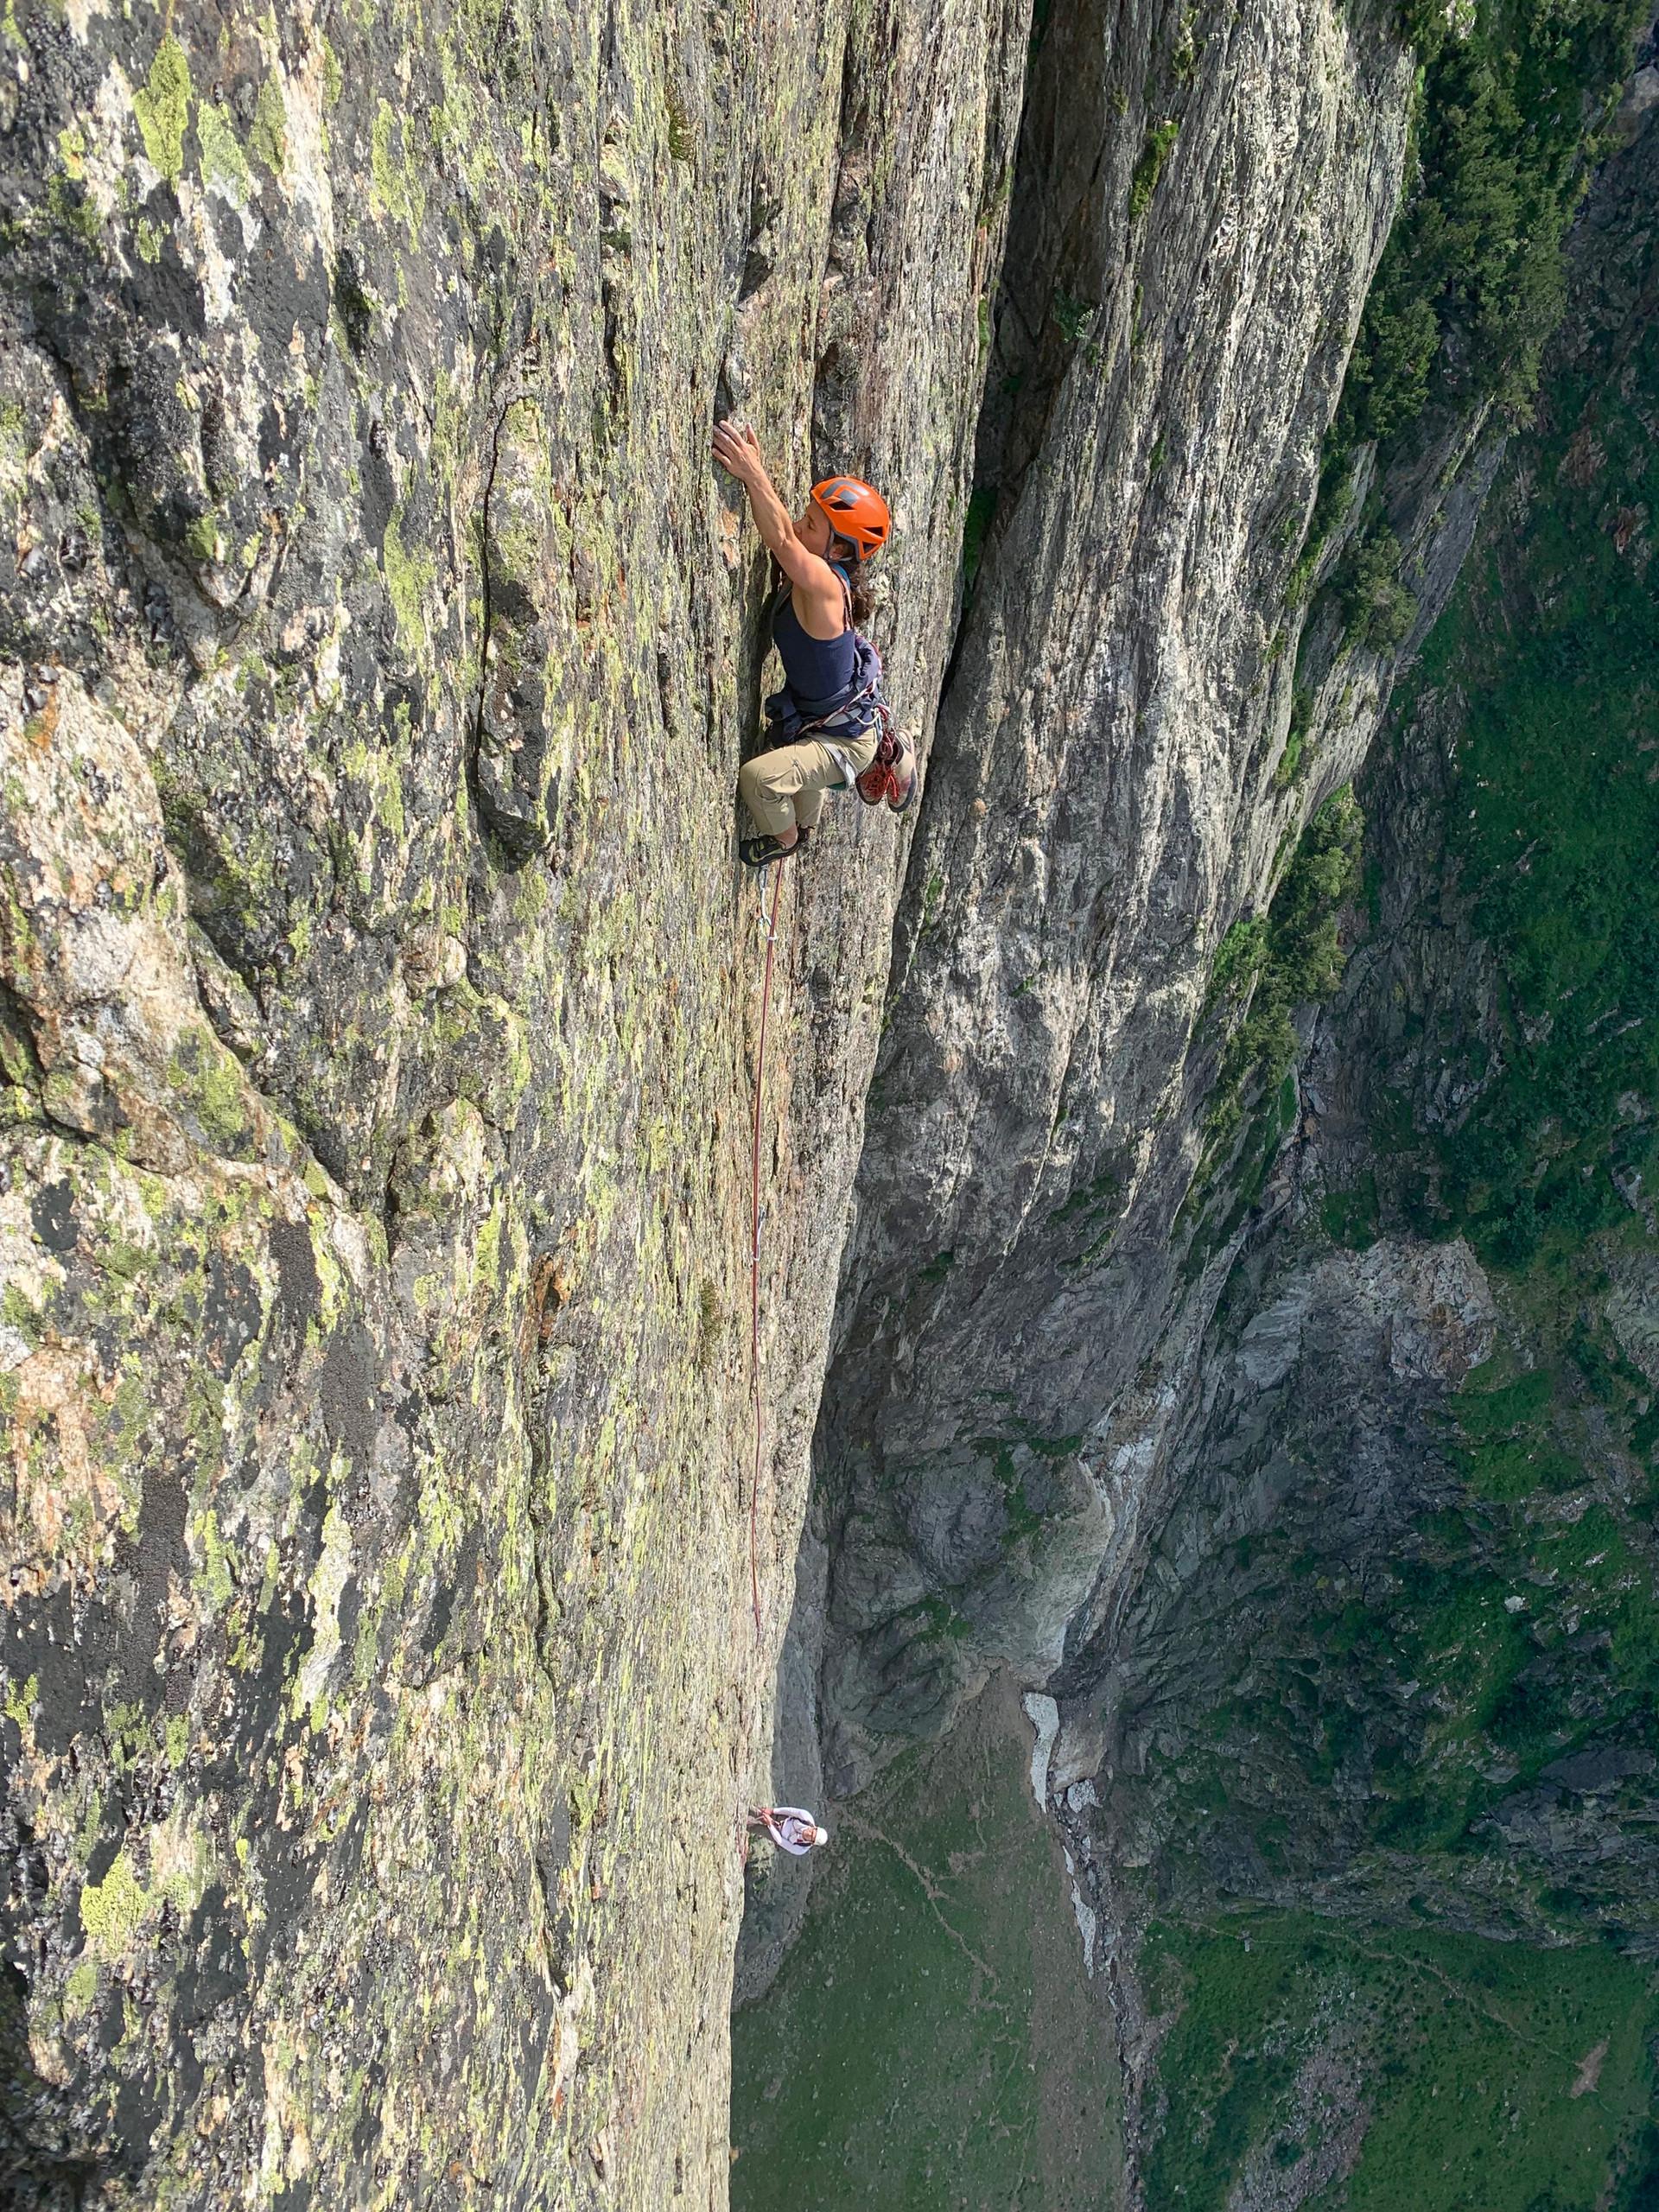 Mittagflue, Klettern, Bergführer